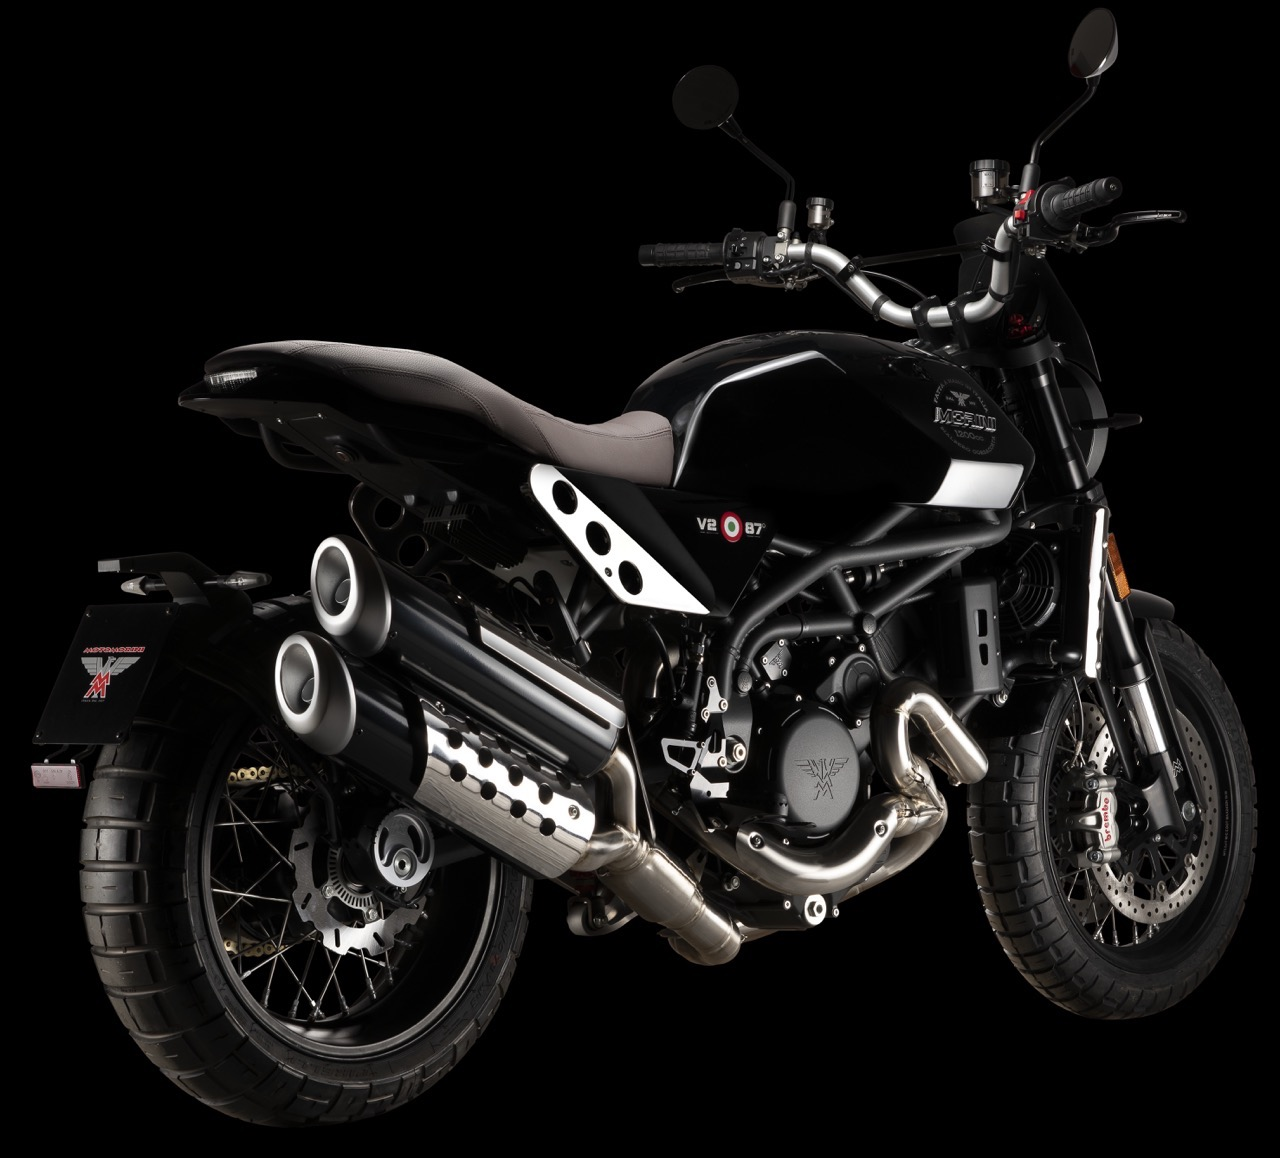 EICMA 2019 - Moto Morini X-Cape - MotoNews - Andar de Moto